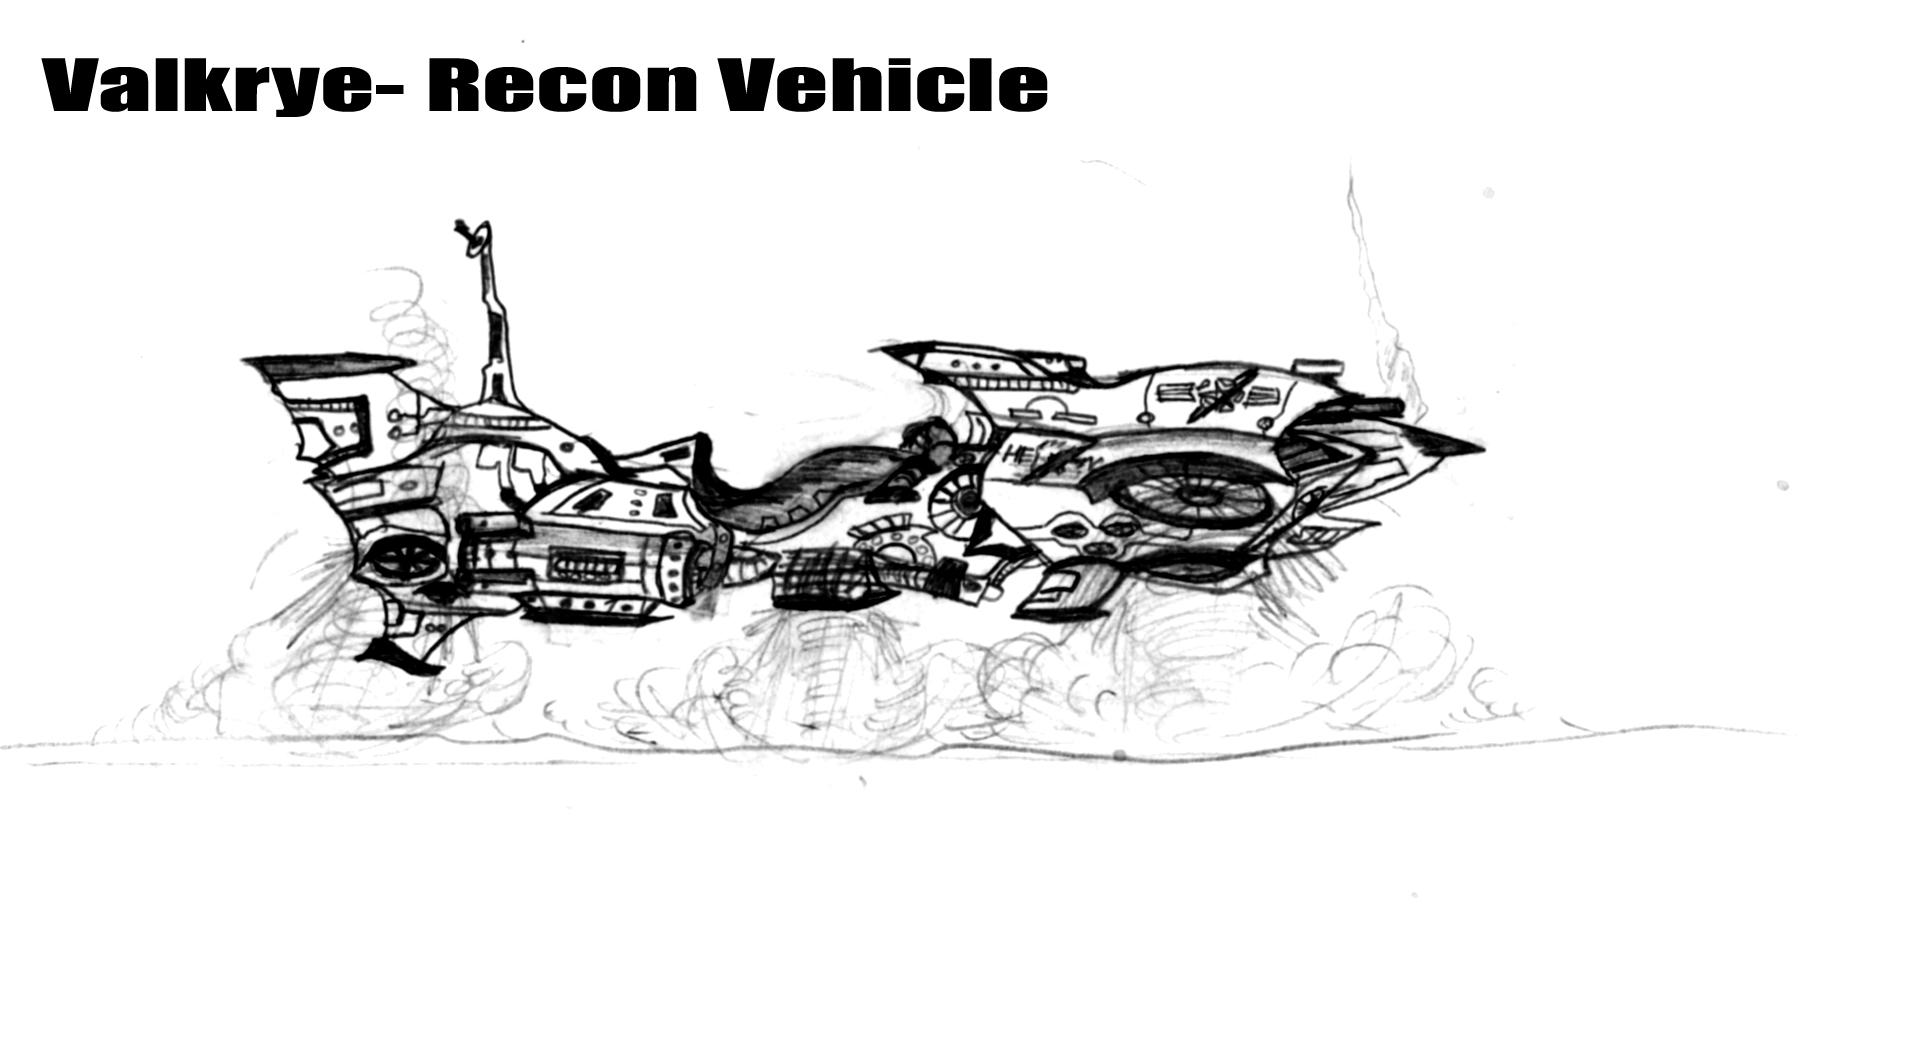 Valkrye  Recon